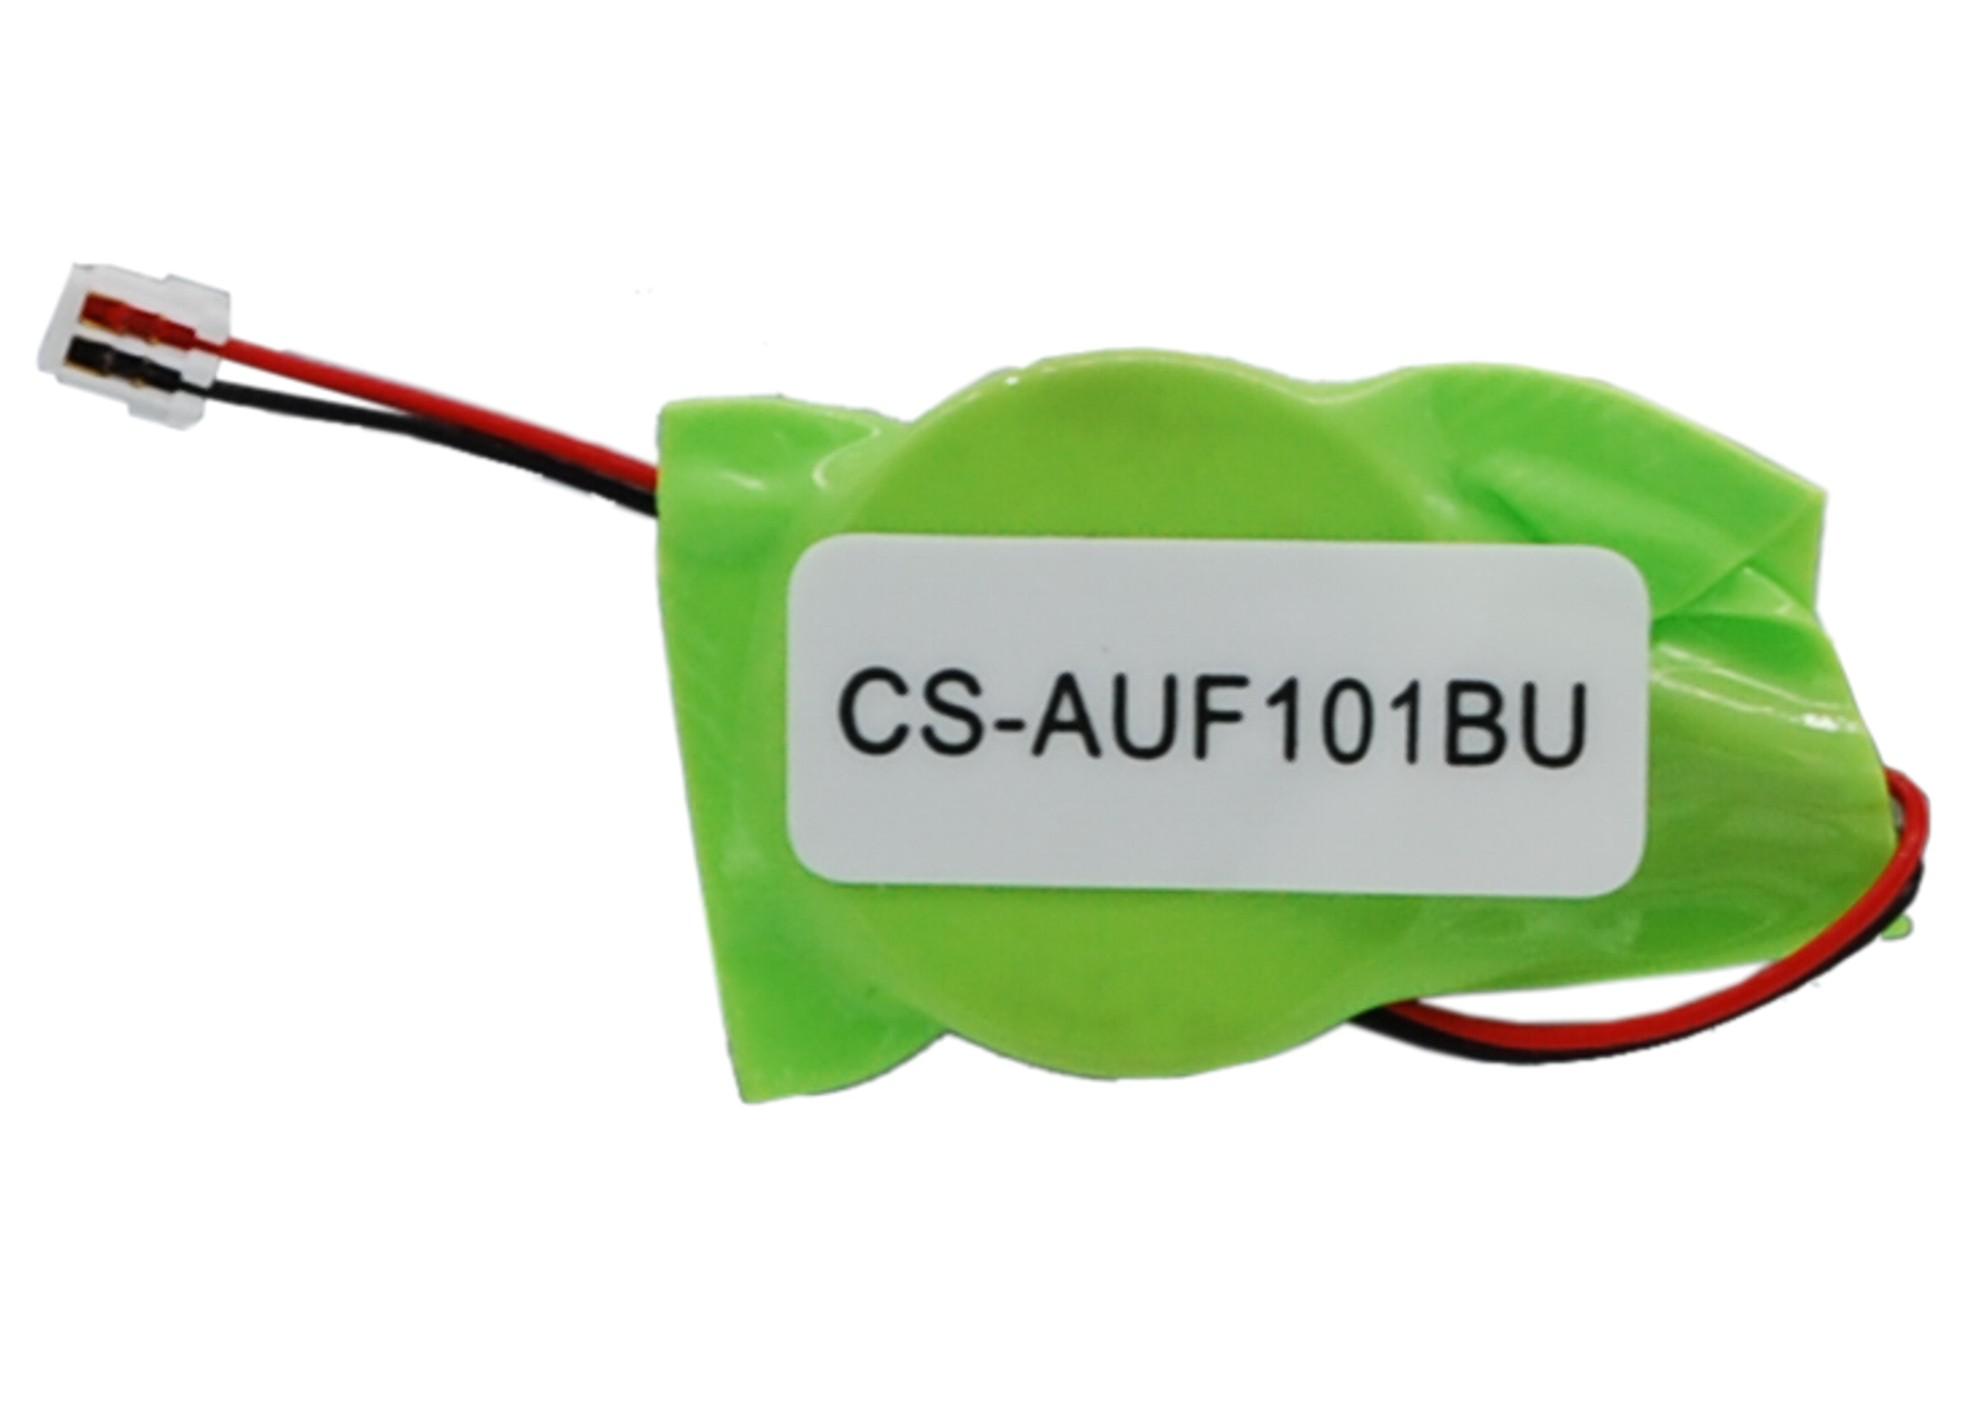 Cameron Sino baterie cmos pro ASUS Eee Pad Transformer TF101-1b029A 3V Li-ion 40mAh zelená - neoriginální